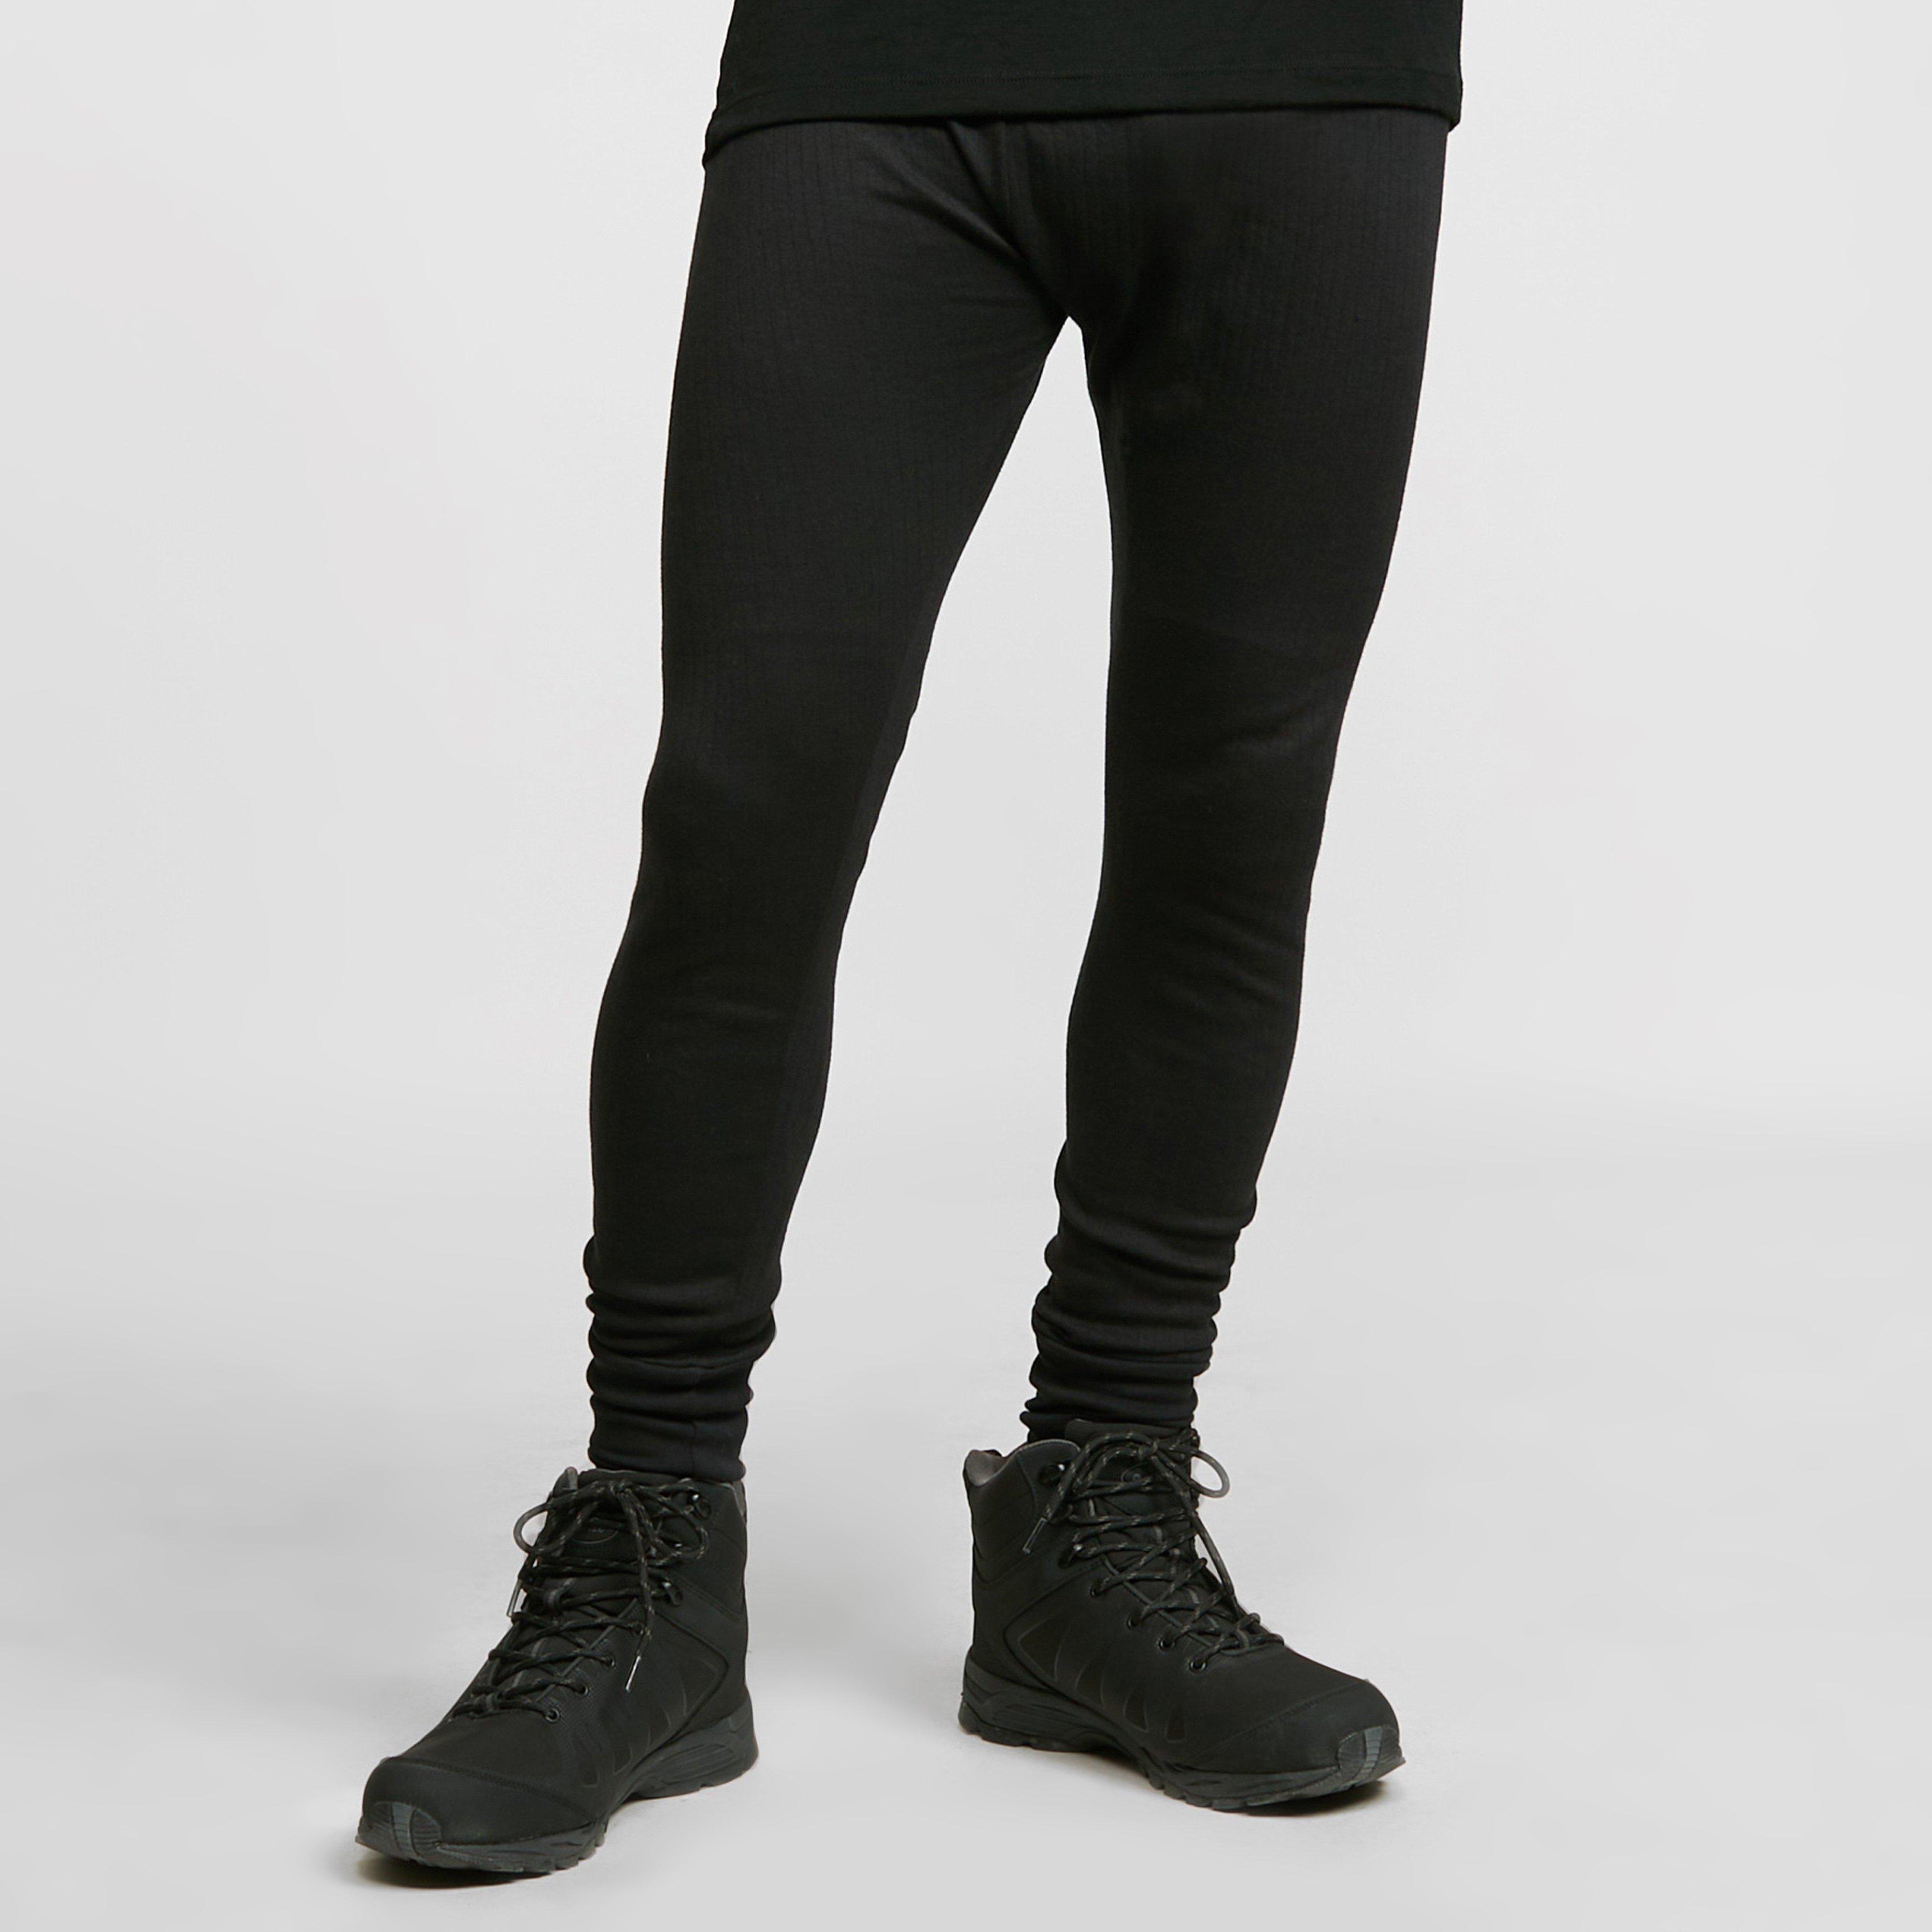 Image of Freedomtrail Thermal Baselayer Long Johns (Unisex) - Black/Black, Black/BLACK